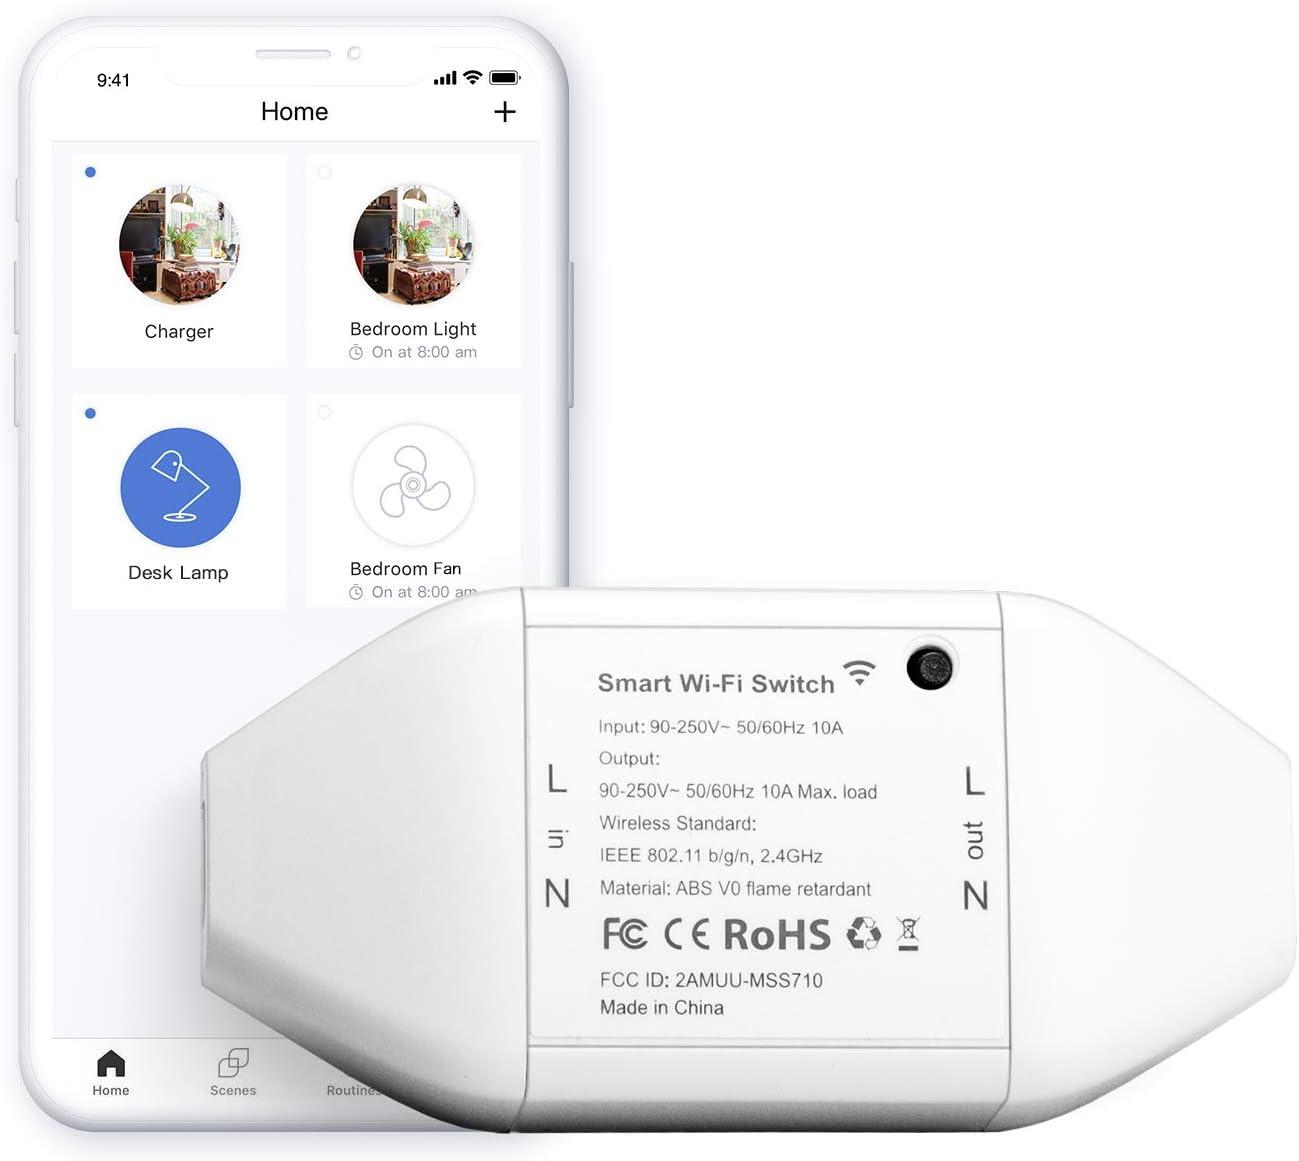 Interruptor Universal Inteligente con Wi-Fi, con Control Remoto Meross App. Compatible con Alexa, Google Assistant y SmartThings. Modelo MSS710